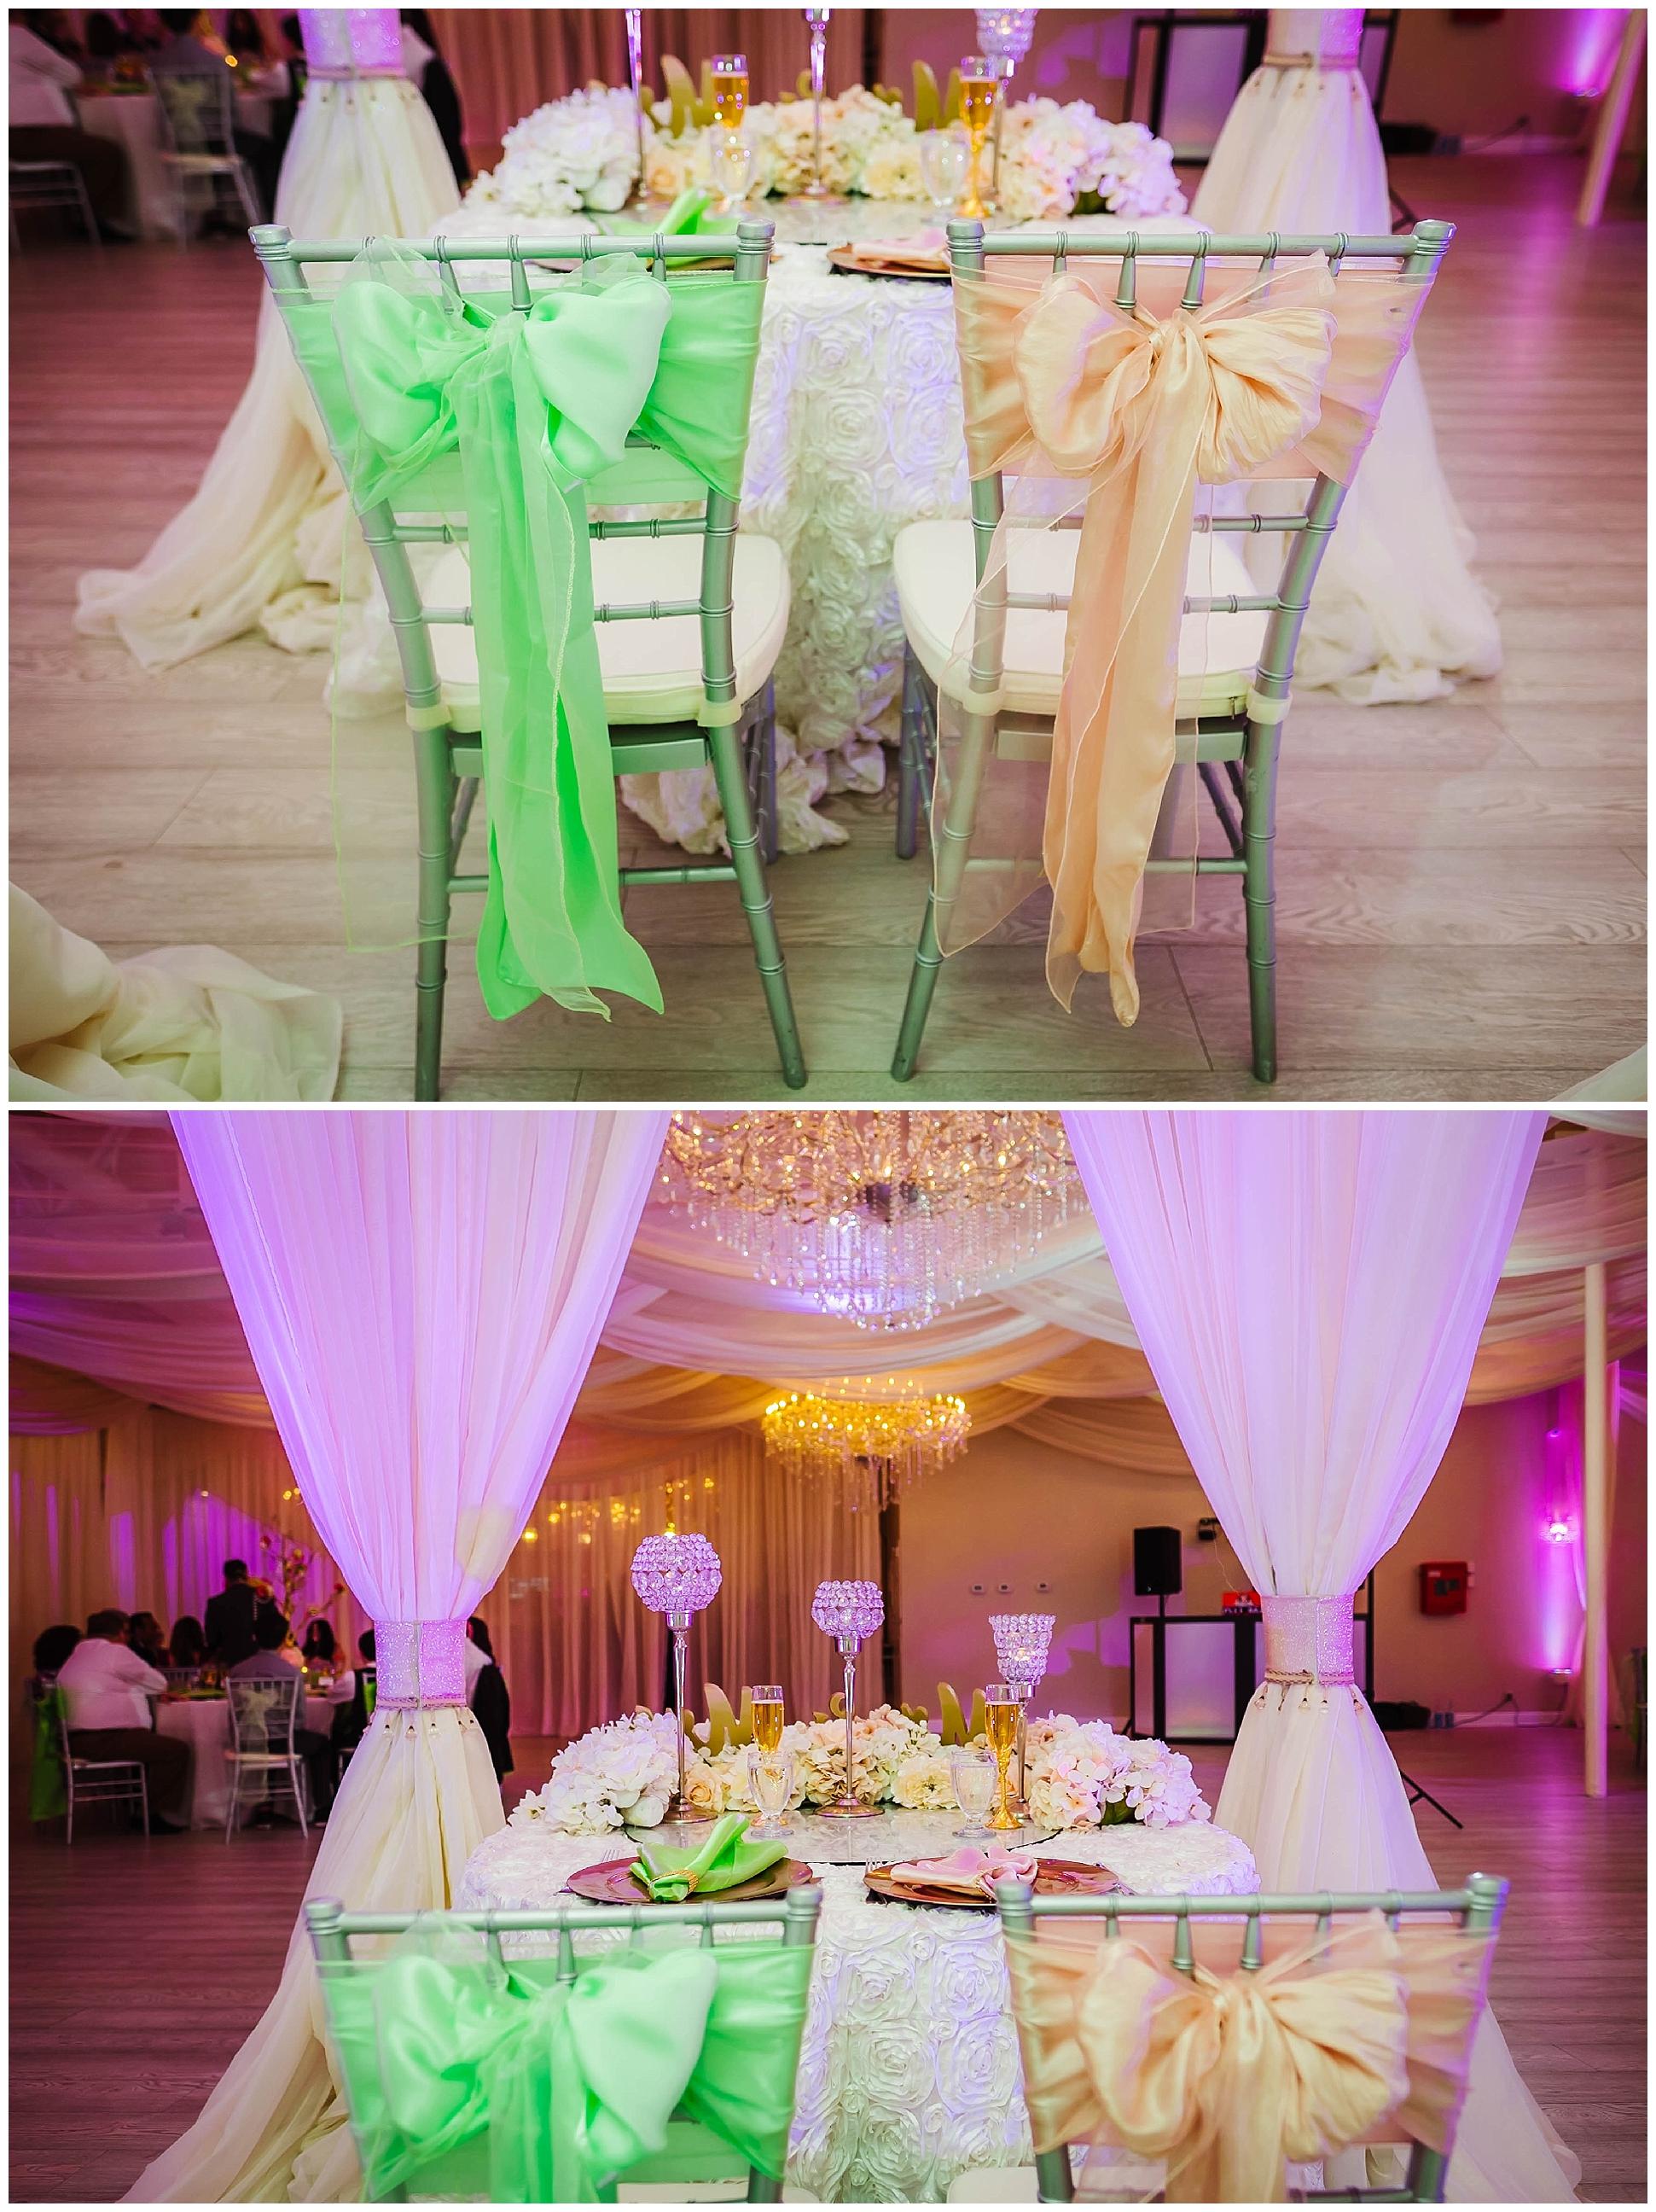 st-pete-wedding-photographer-sunken-gardens-crystal-ballroom-princess-dancer_0178.jpg